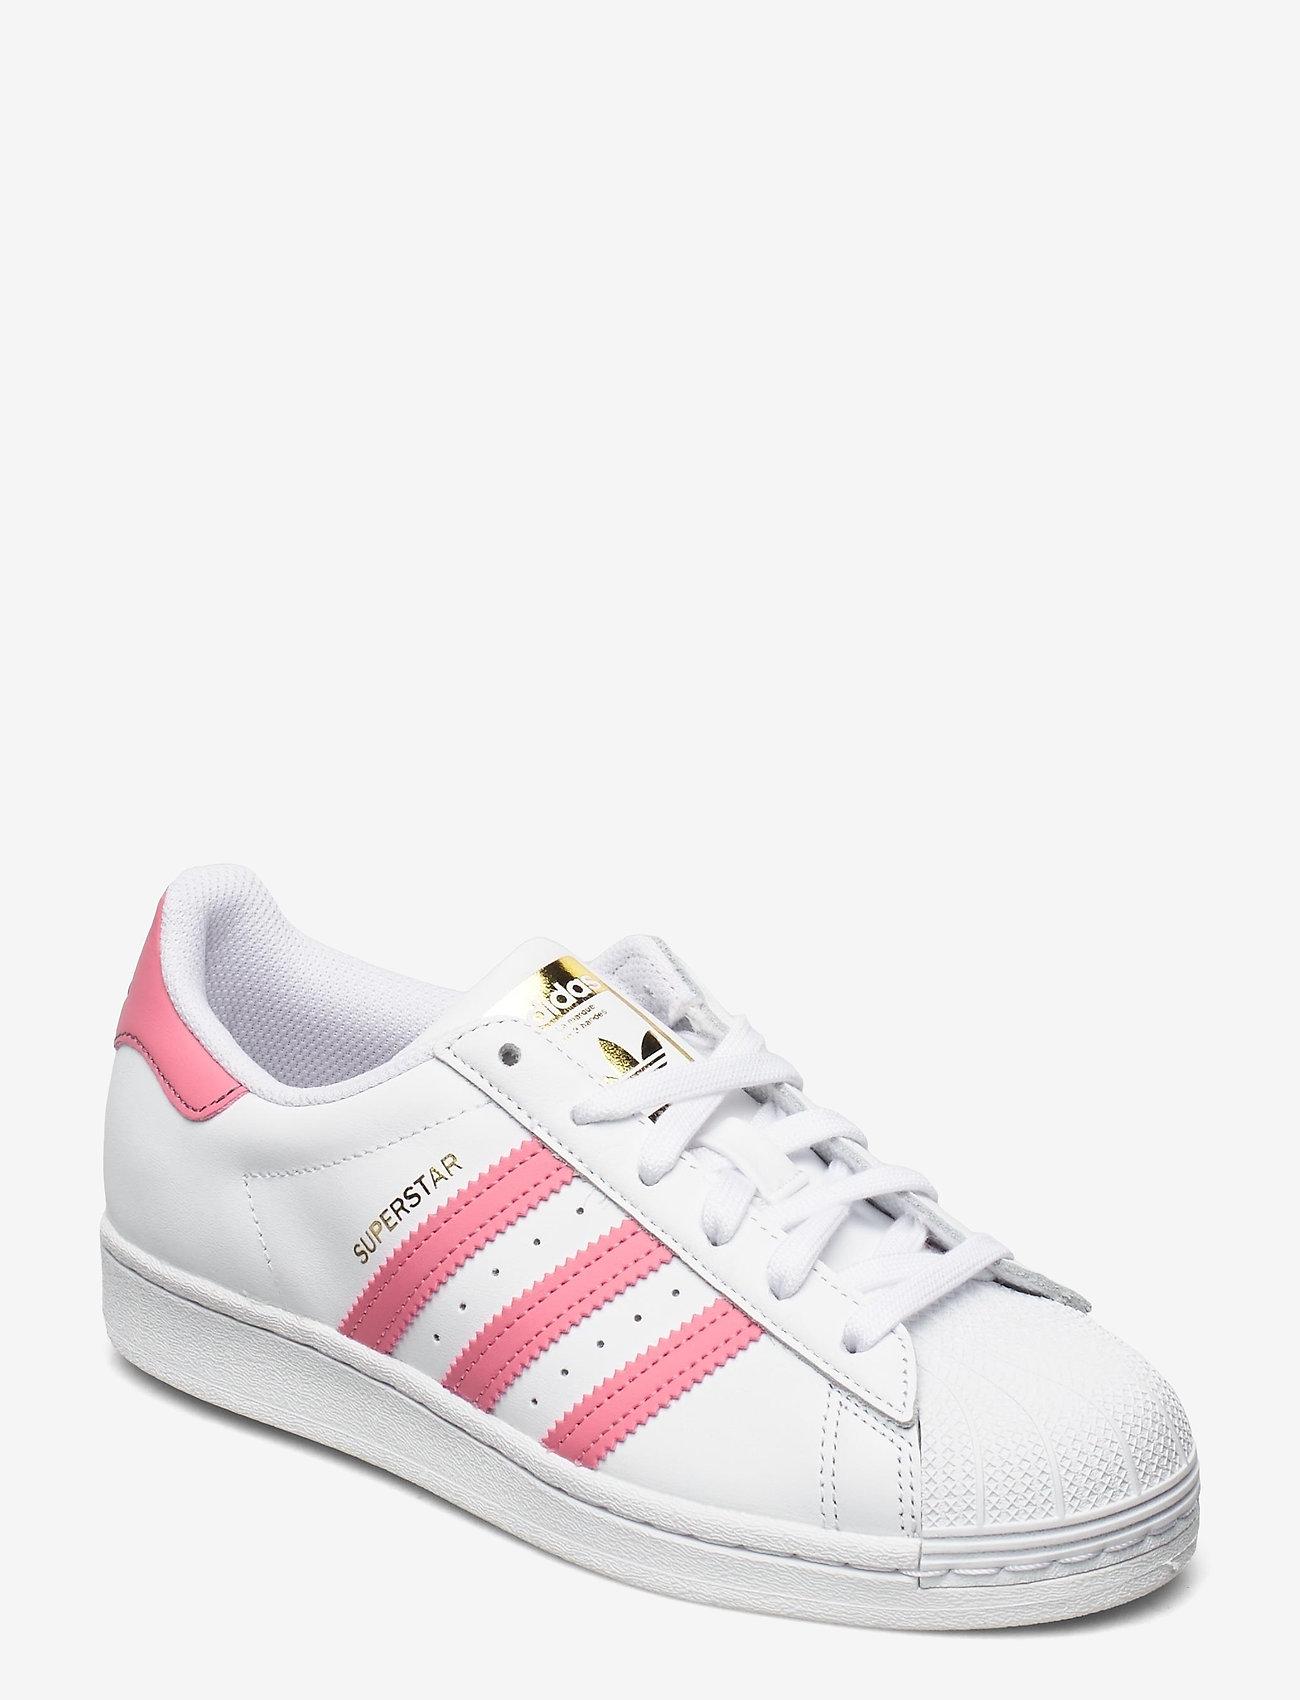 adidas Originals - Superstar W - low top sneakers - ftwwht/bluoxi/goldmt - 1